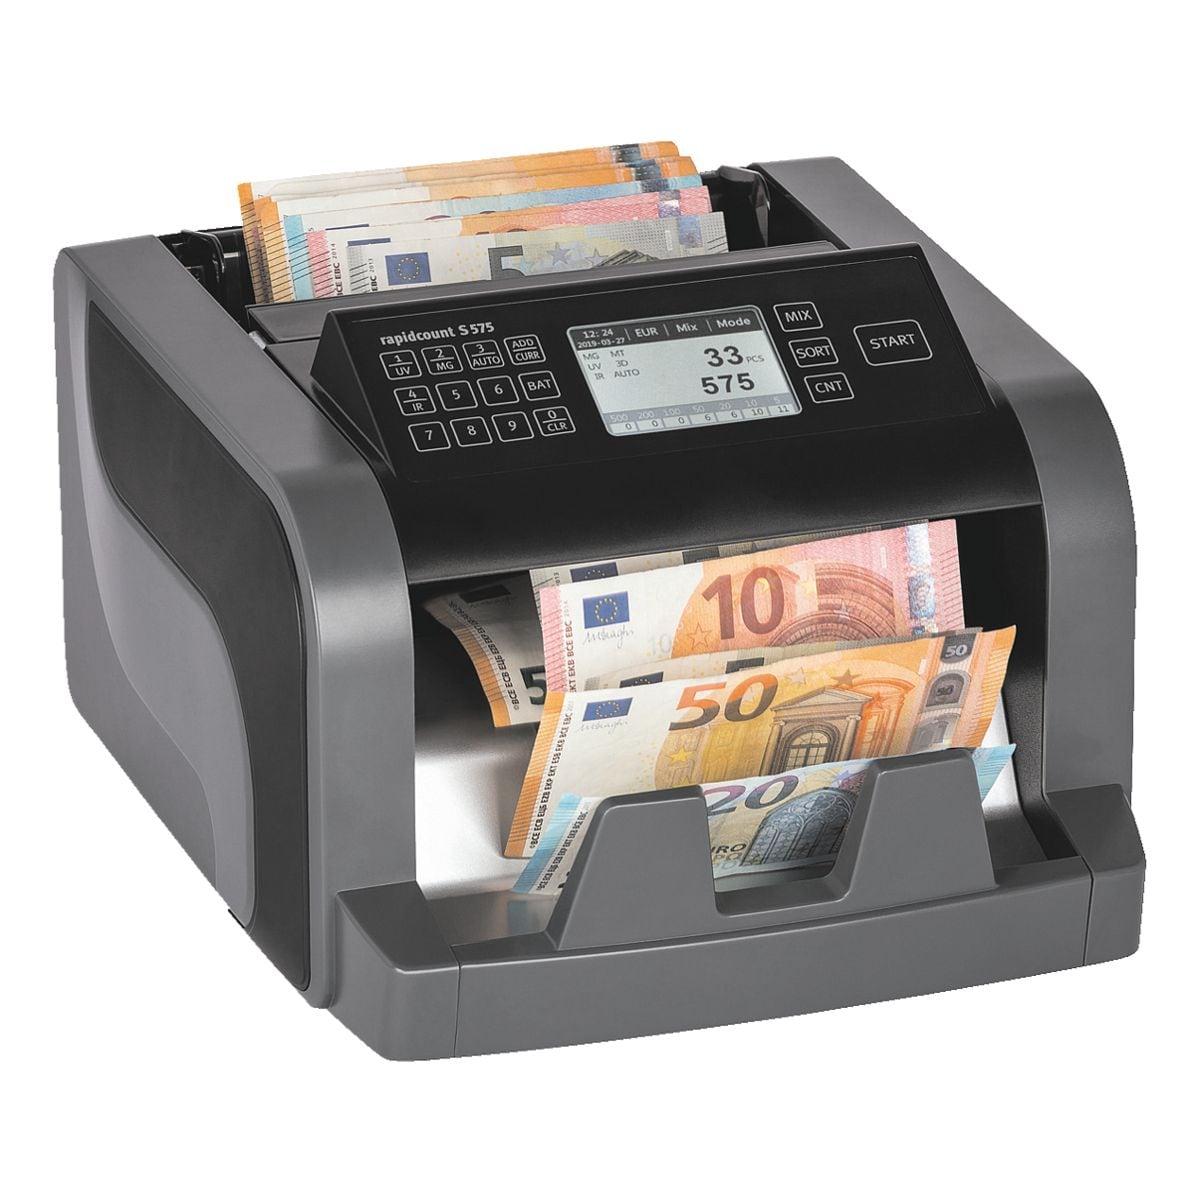 ratiotec Banknotenzählmaschine »Rapidcount S 575«